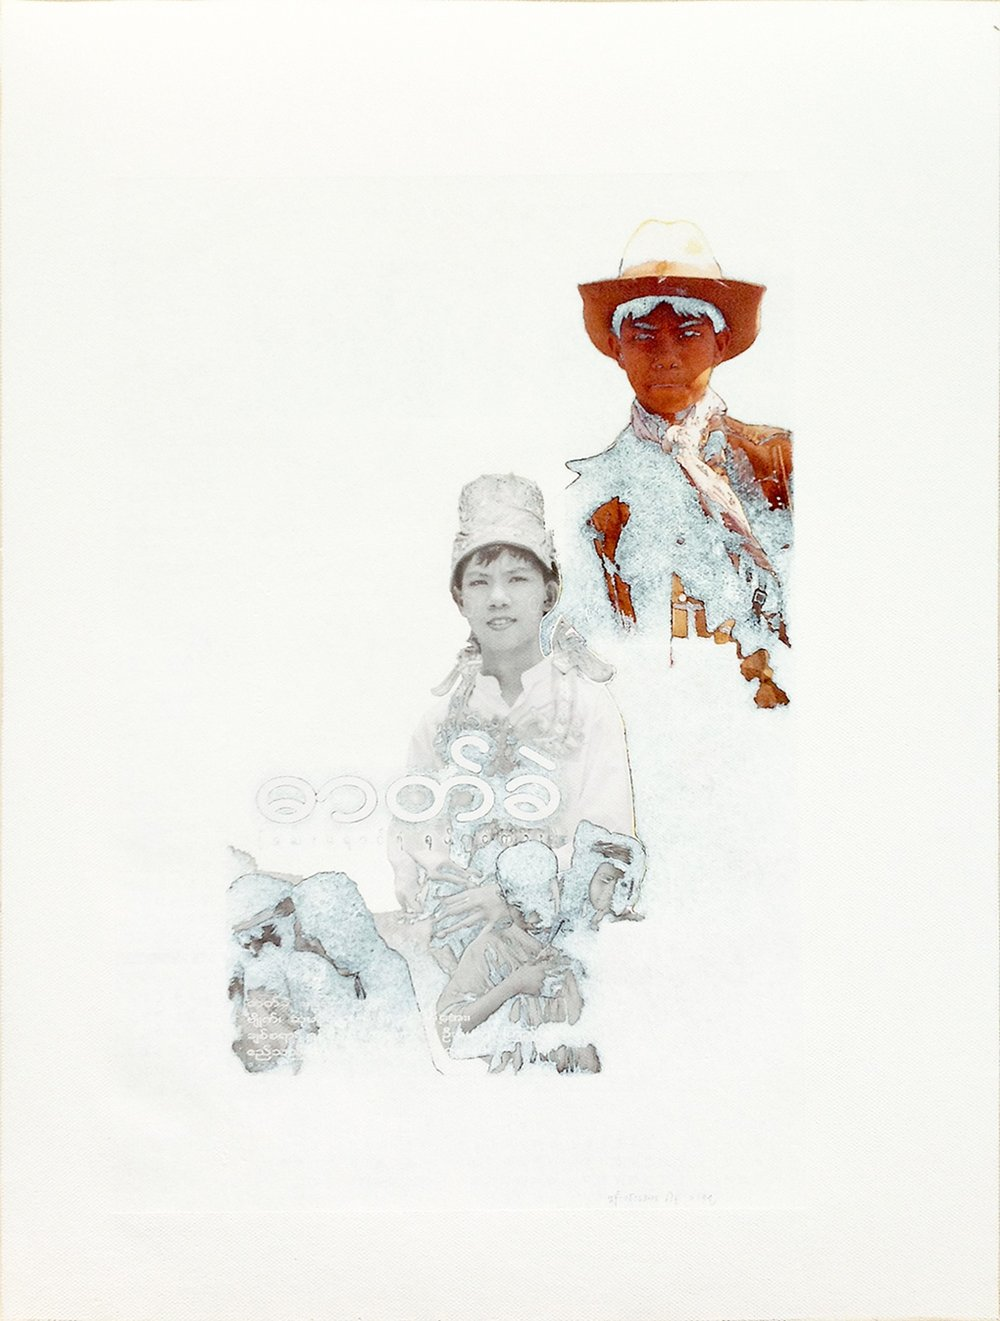 White Piece #0157: Dat Khe